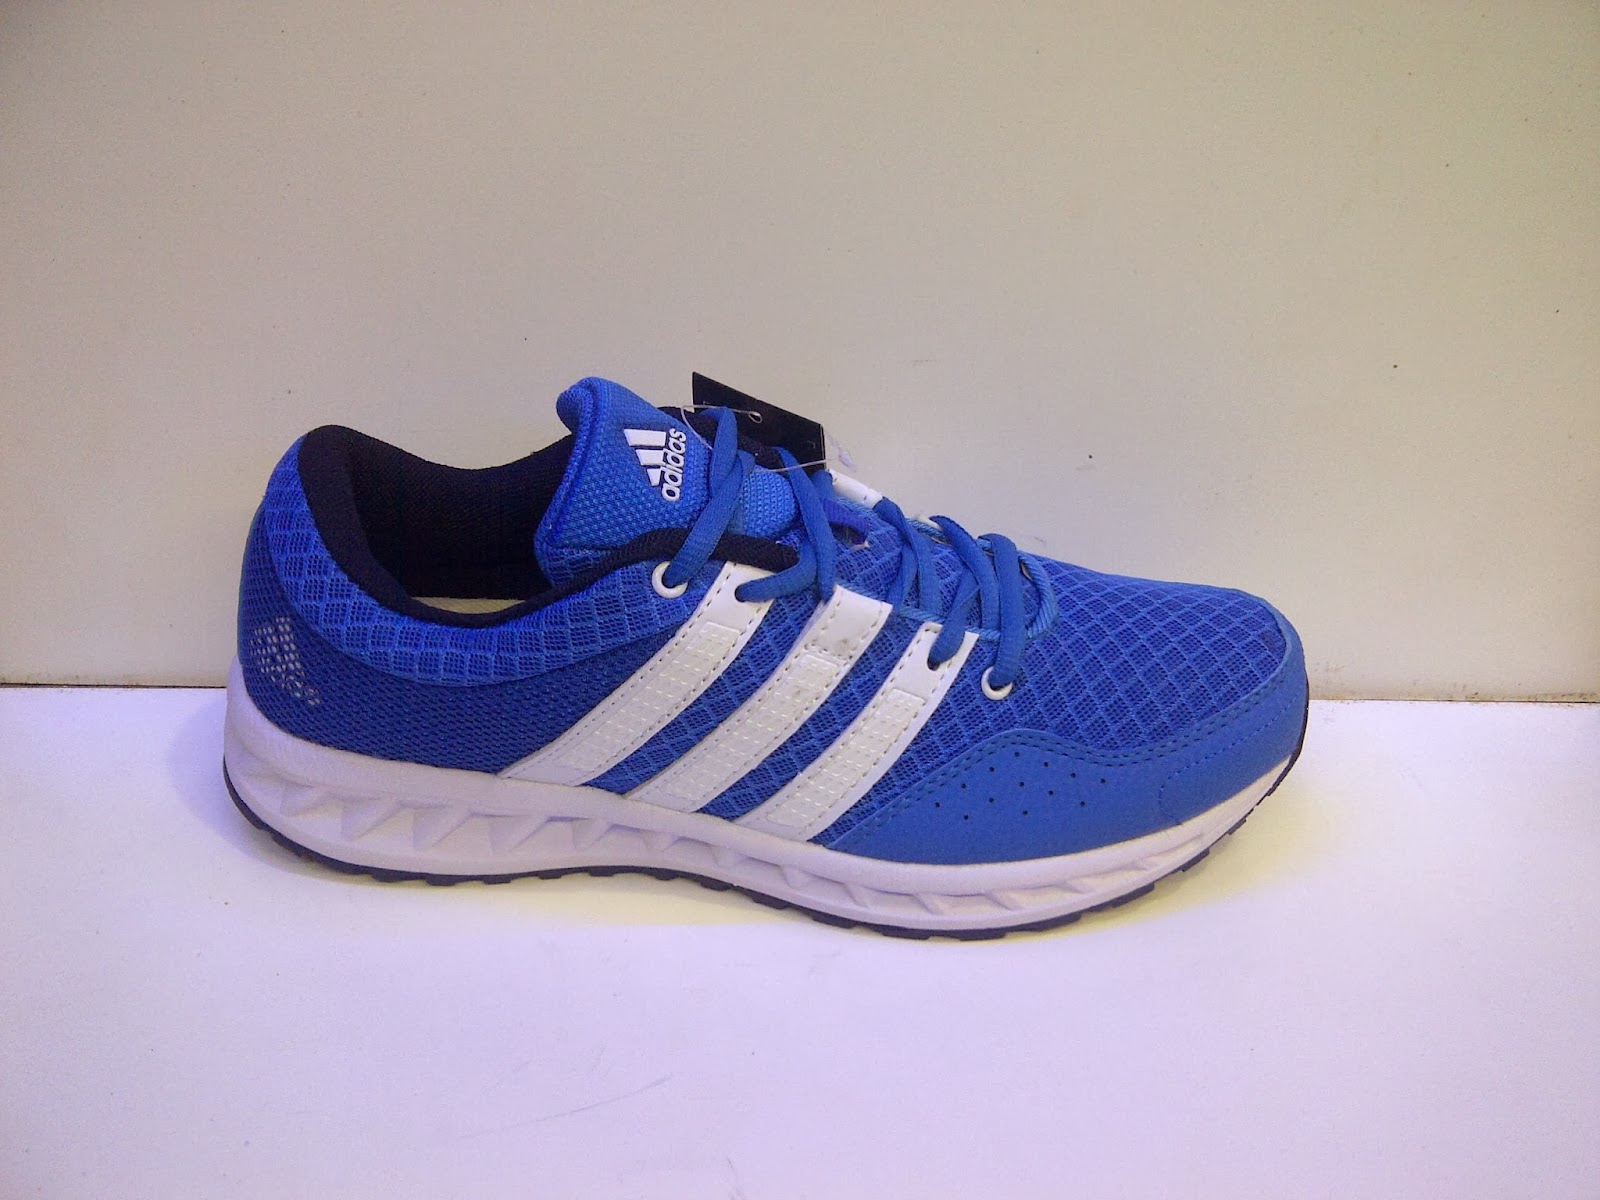 Foto Adidas Falcon Elite 2, adidas running biru, toko sepatu adidas, adidas senam, adidas aerobik